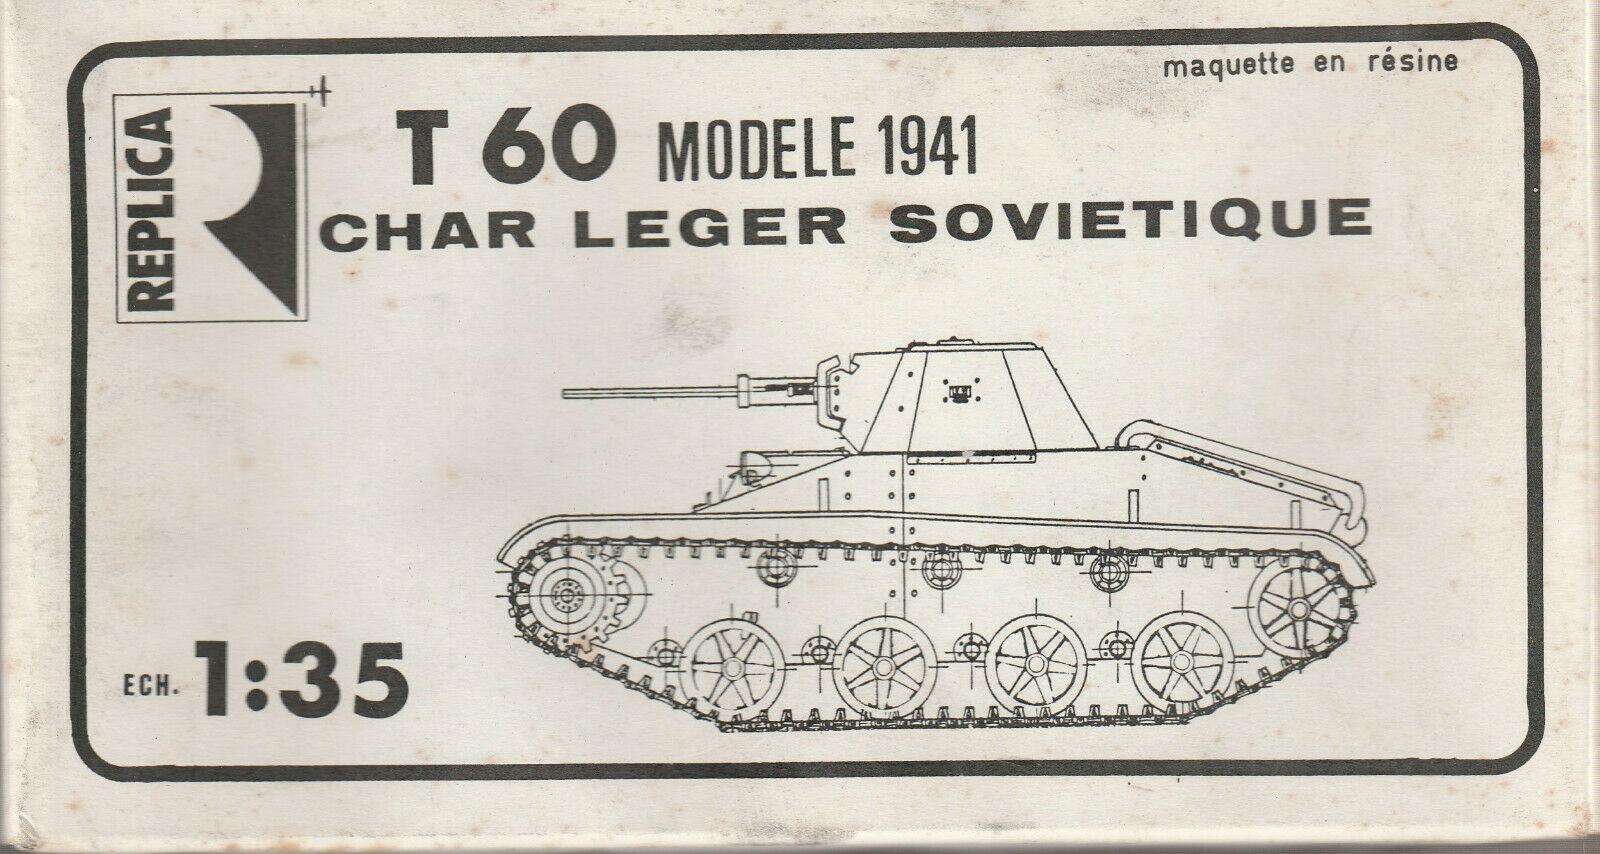 T 60 Modele 1941 Char Leger Sovietique Image